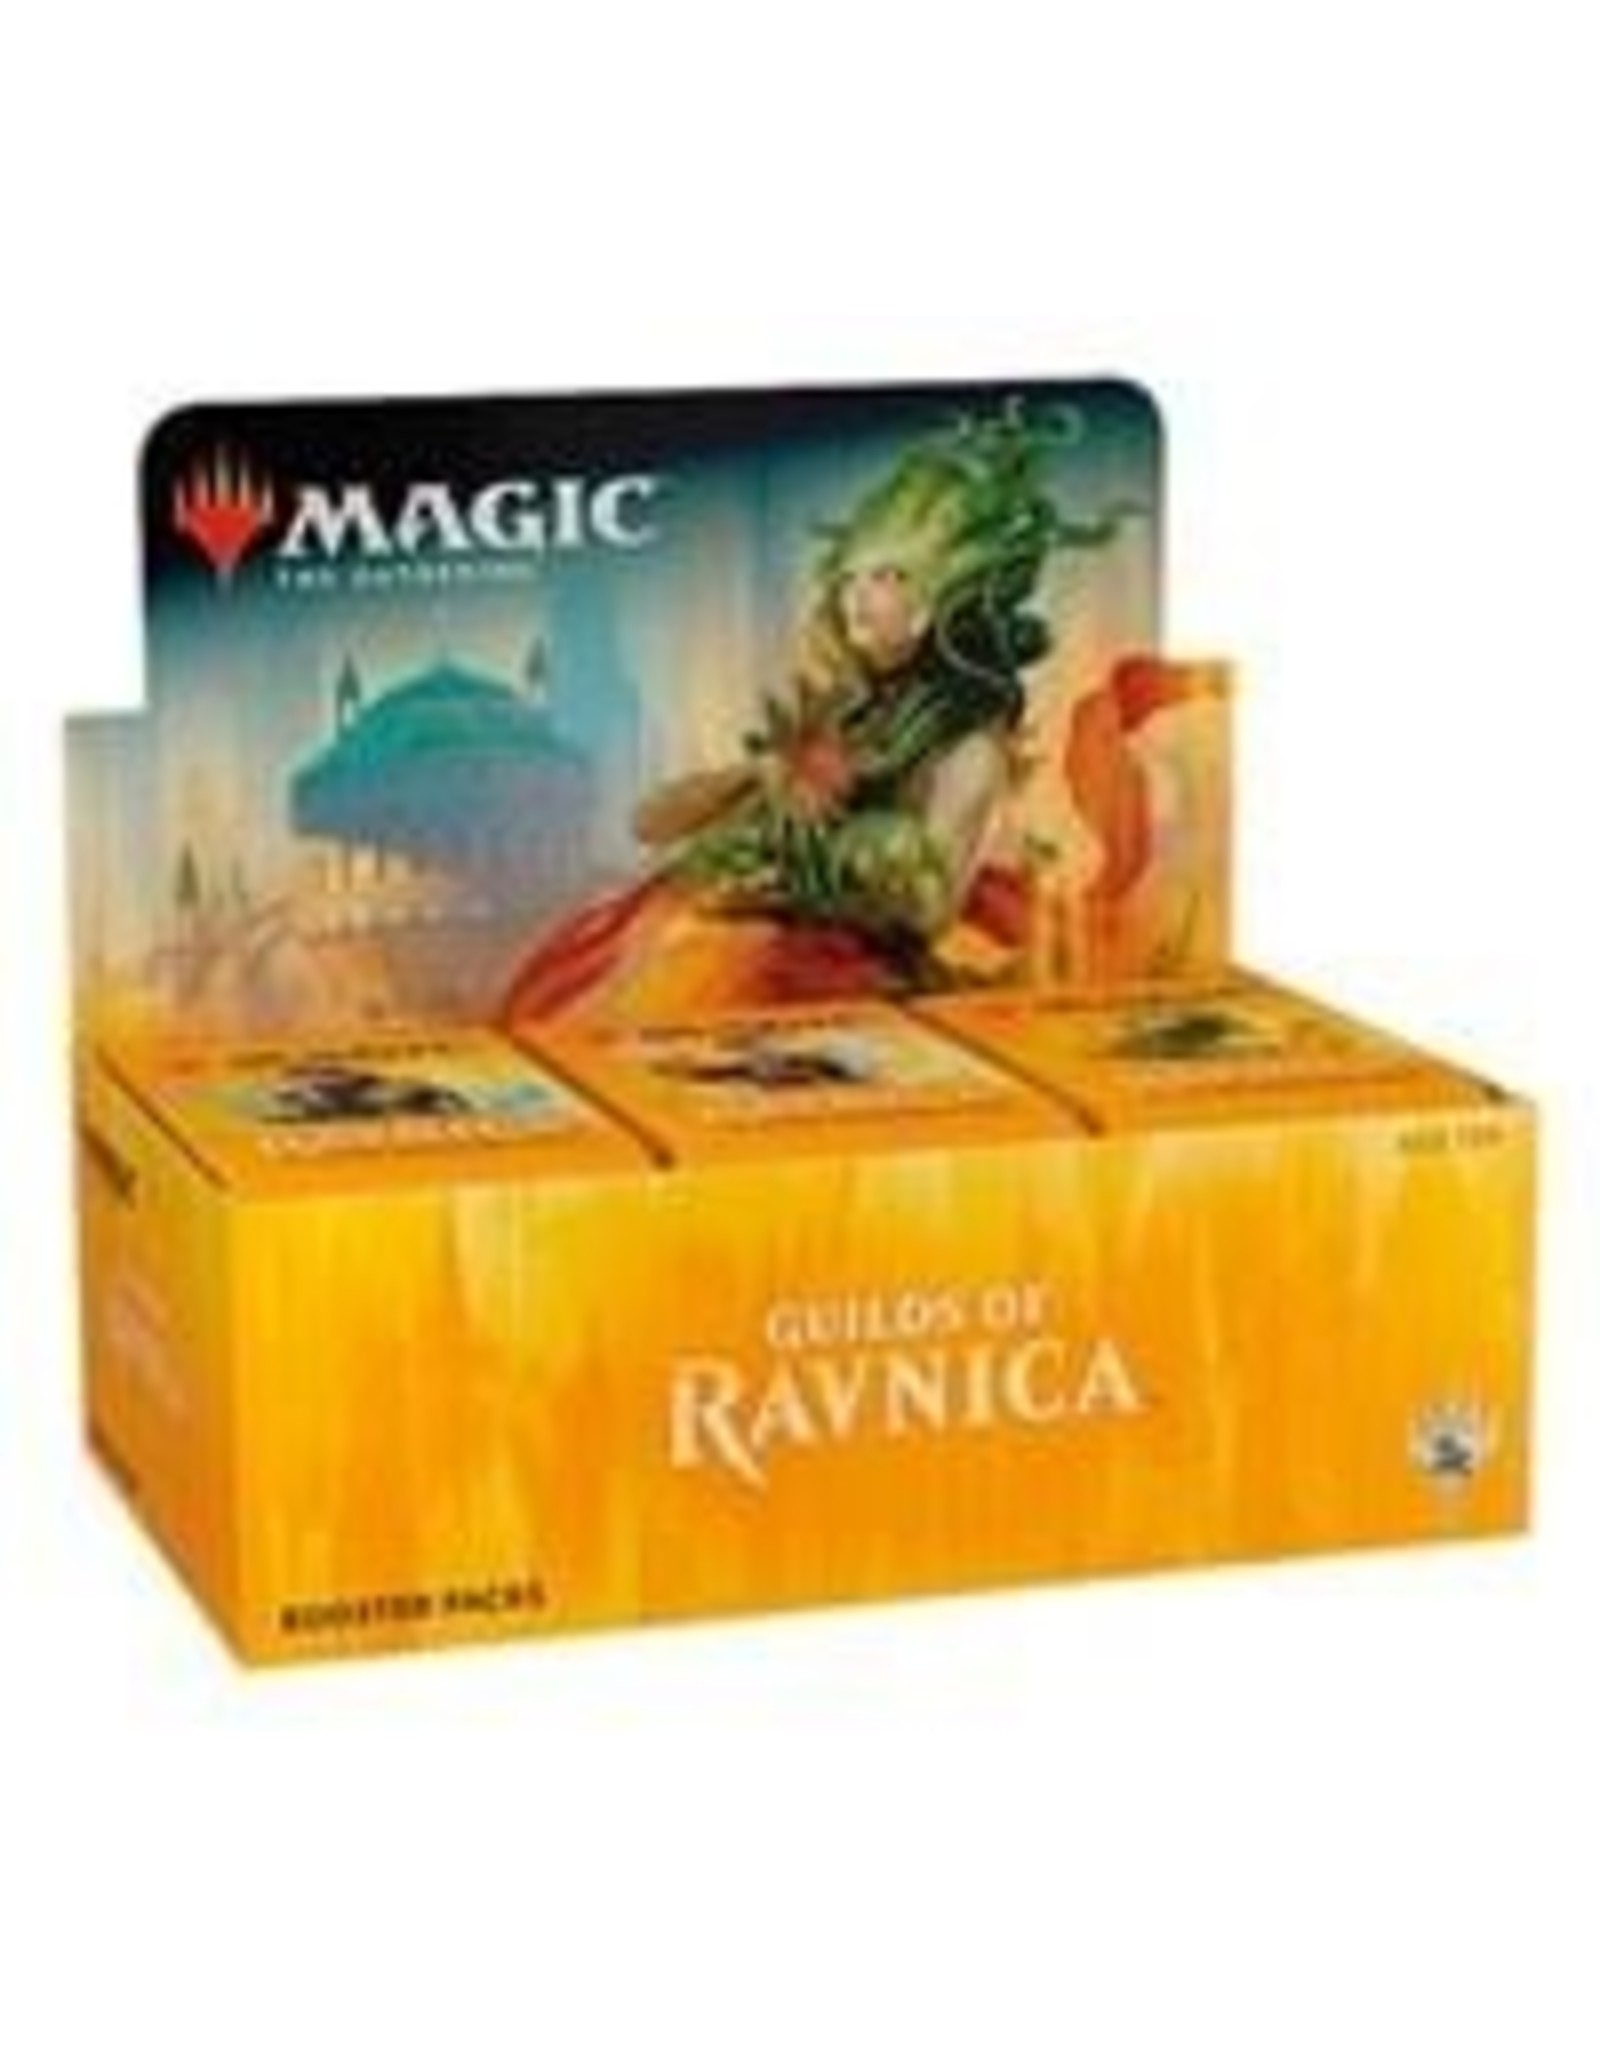 Magic MtG: Guilds of Ravnica Booster Box